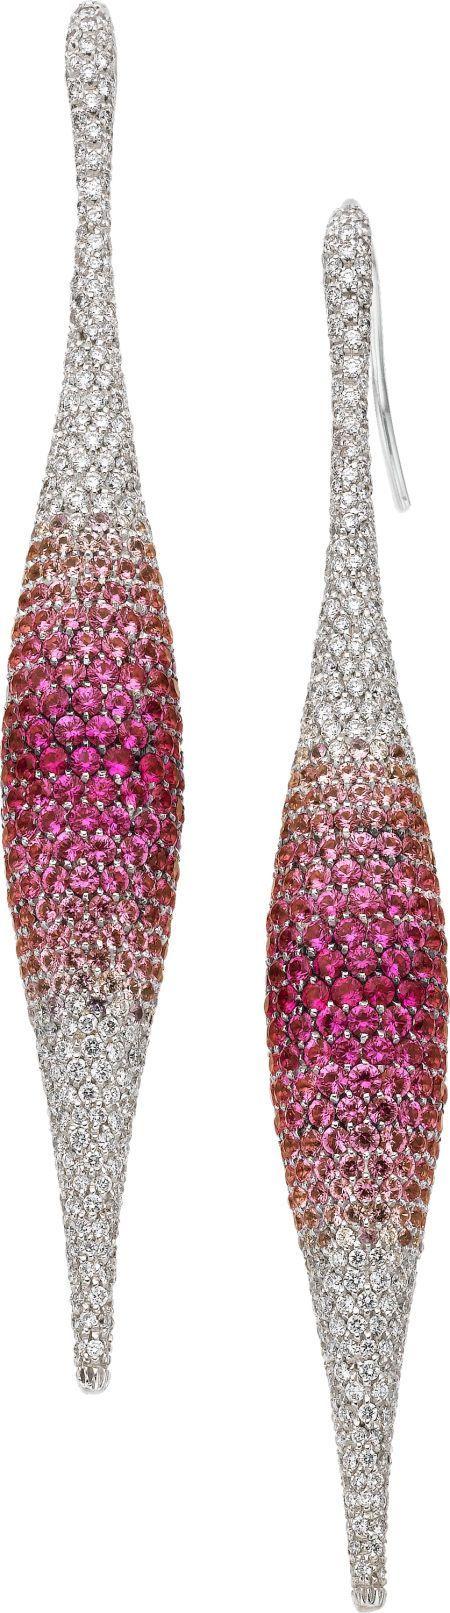 Pink Sapphire, Diamo beauty bling jewelry fashion